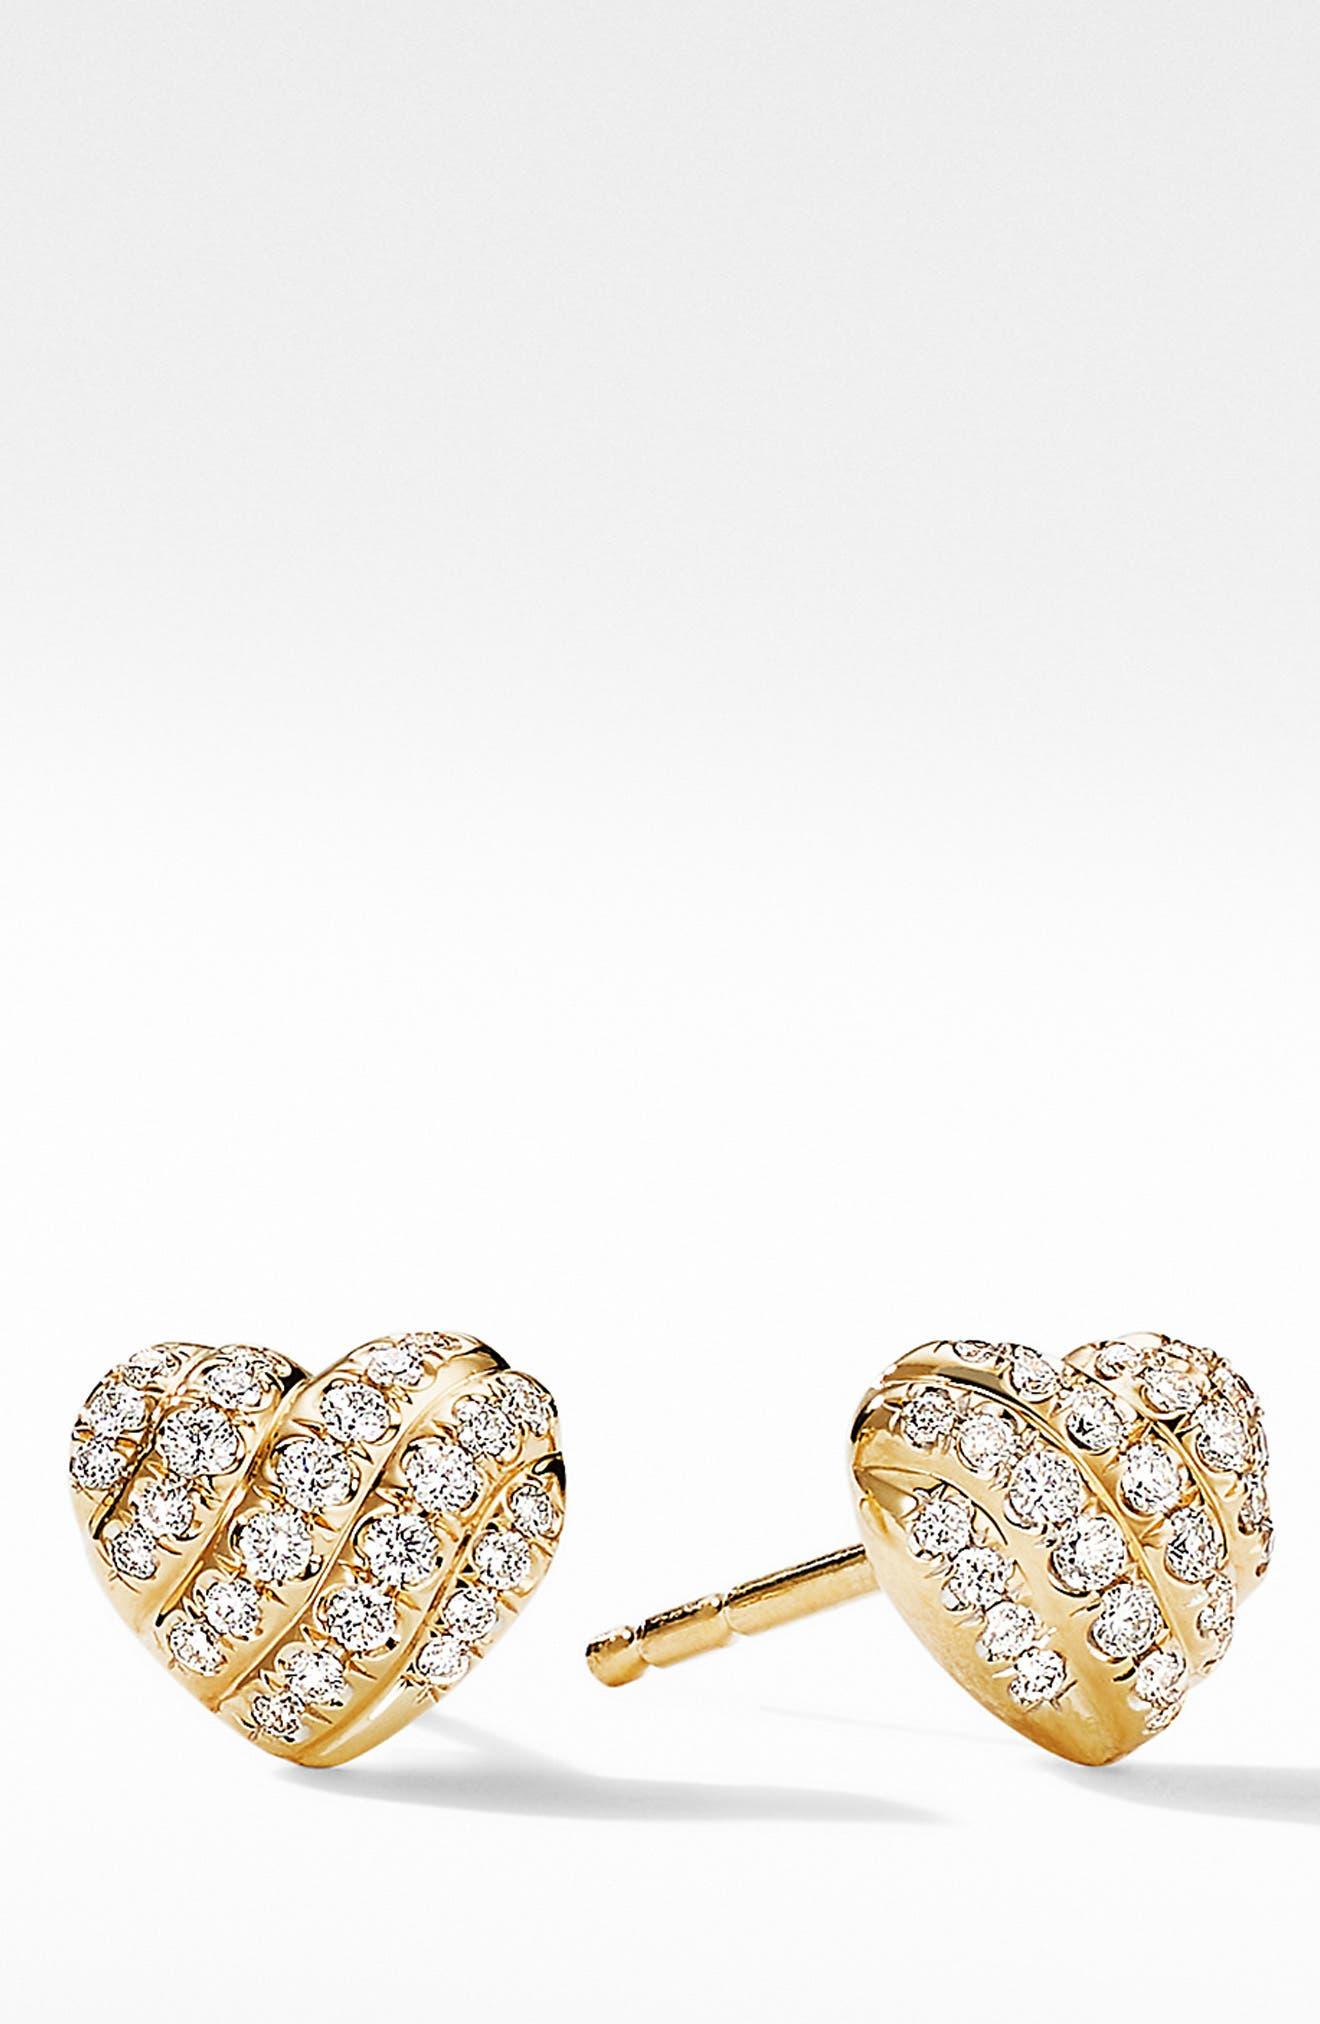 18K 2Tone GOLD GF Pave Simulated Diamond WOMENS GIRLS Dress Heart Stud EARRINGS